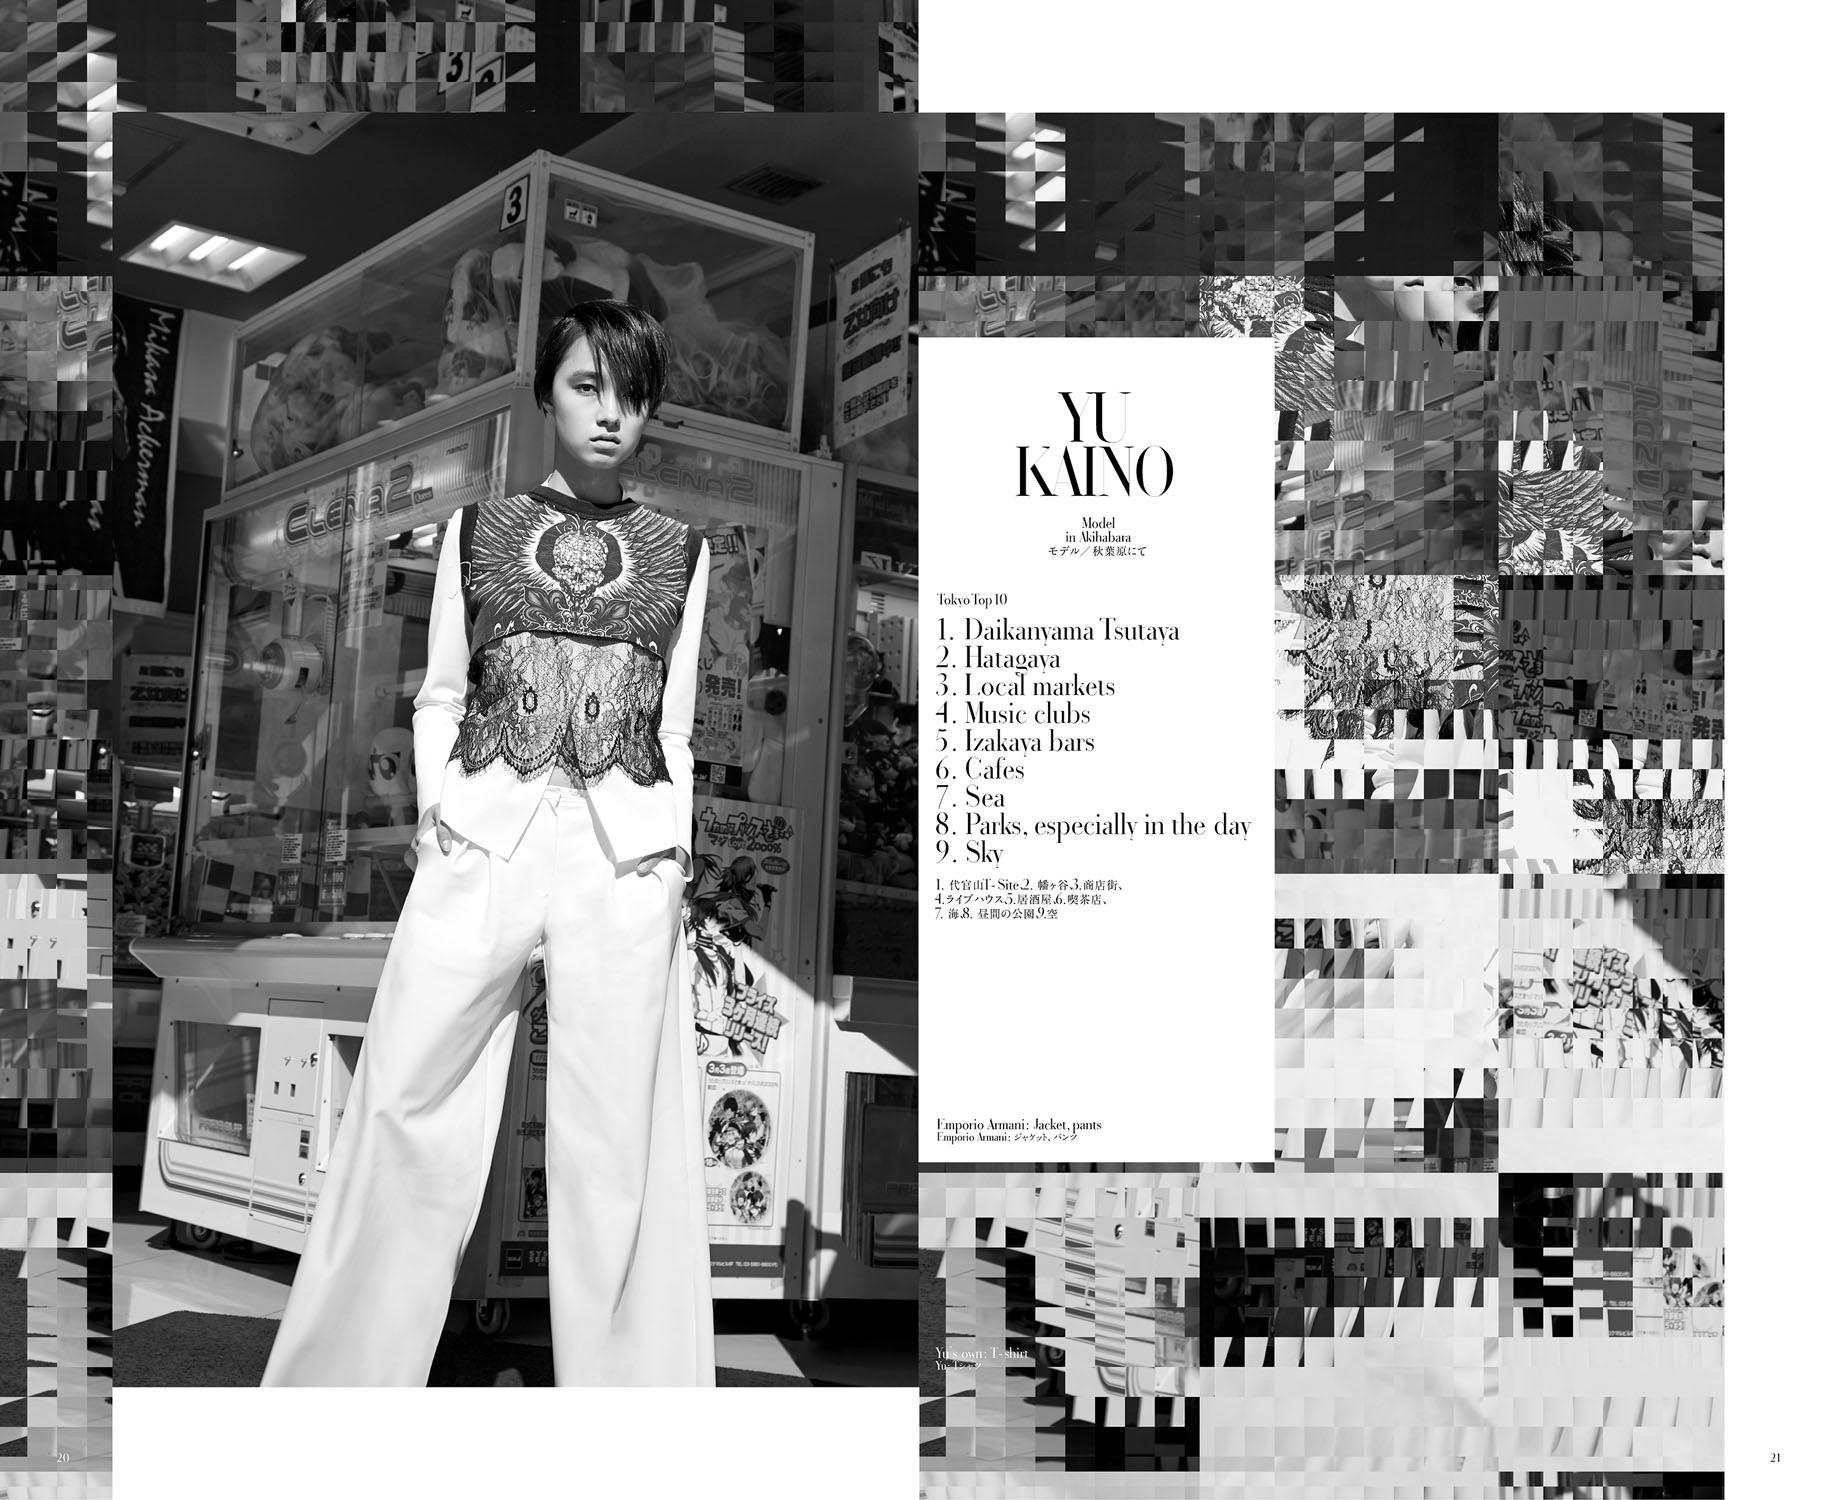 the reality show magazine | YU KAINO | photography by Carlotta manaigo